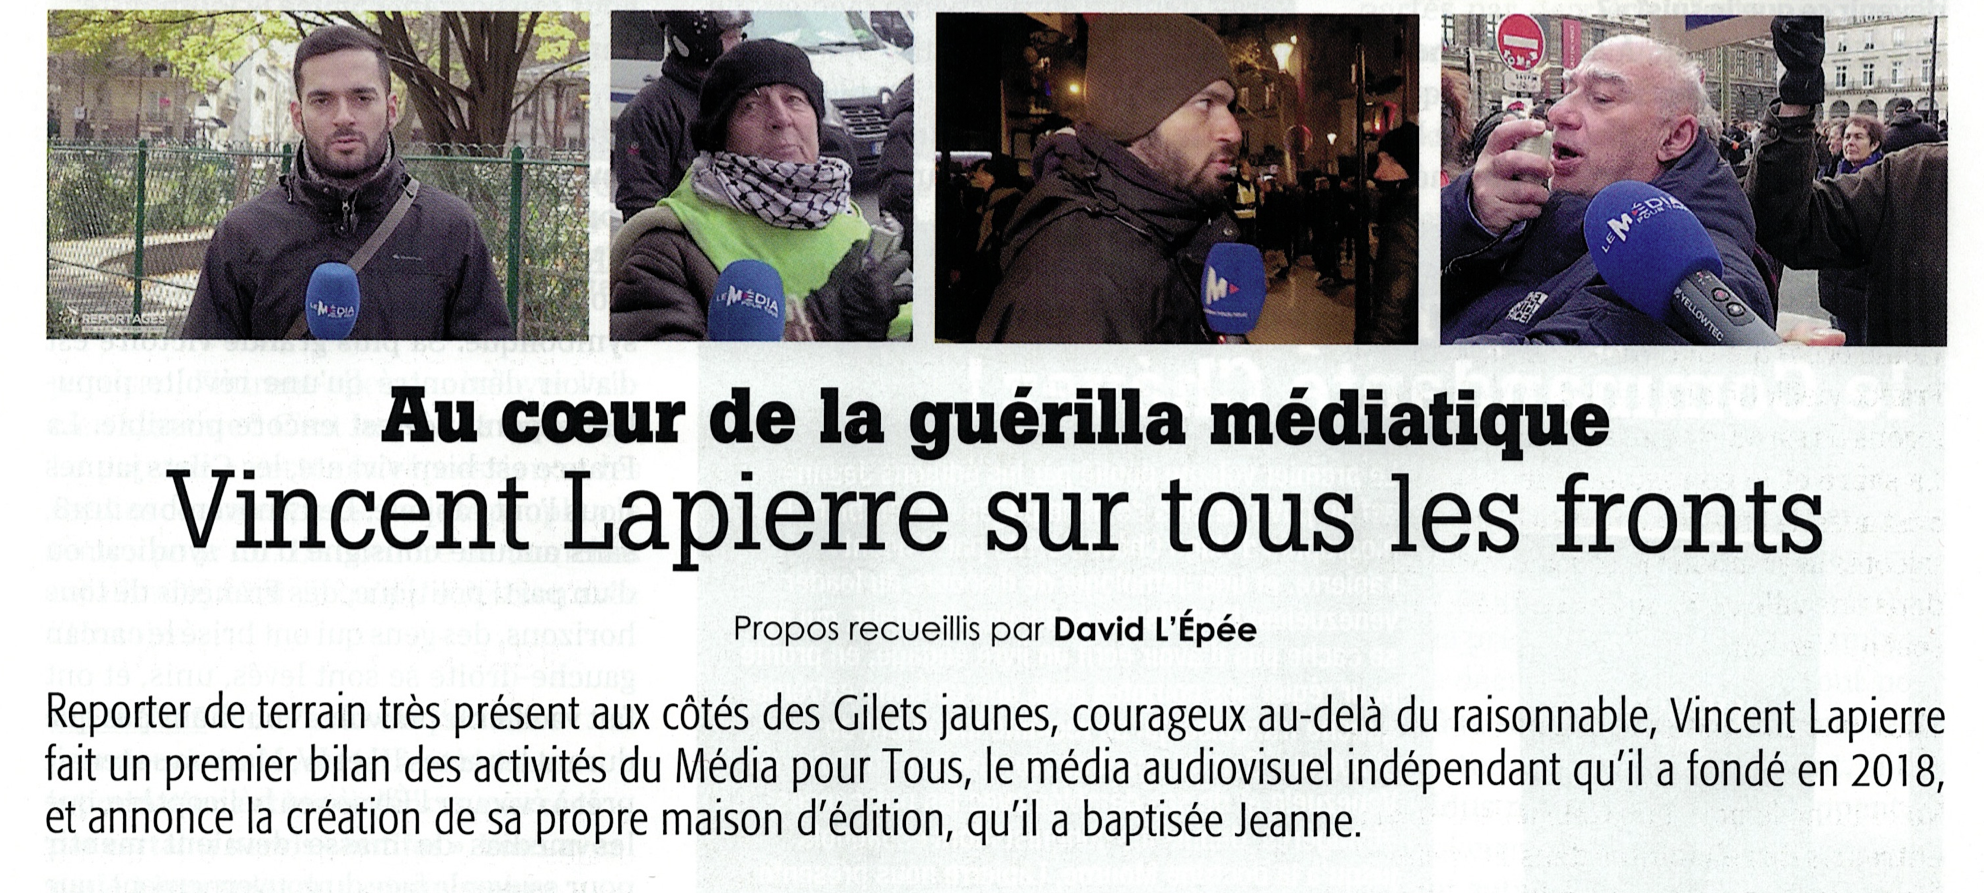 image Lapierre